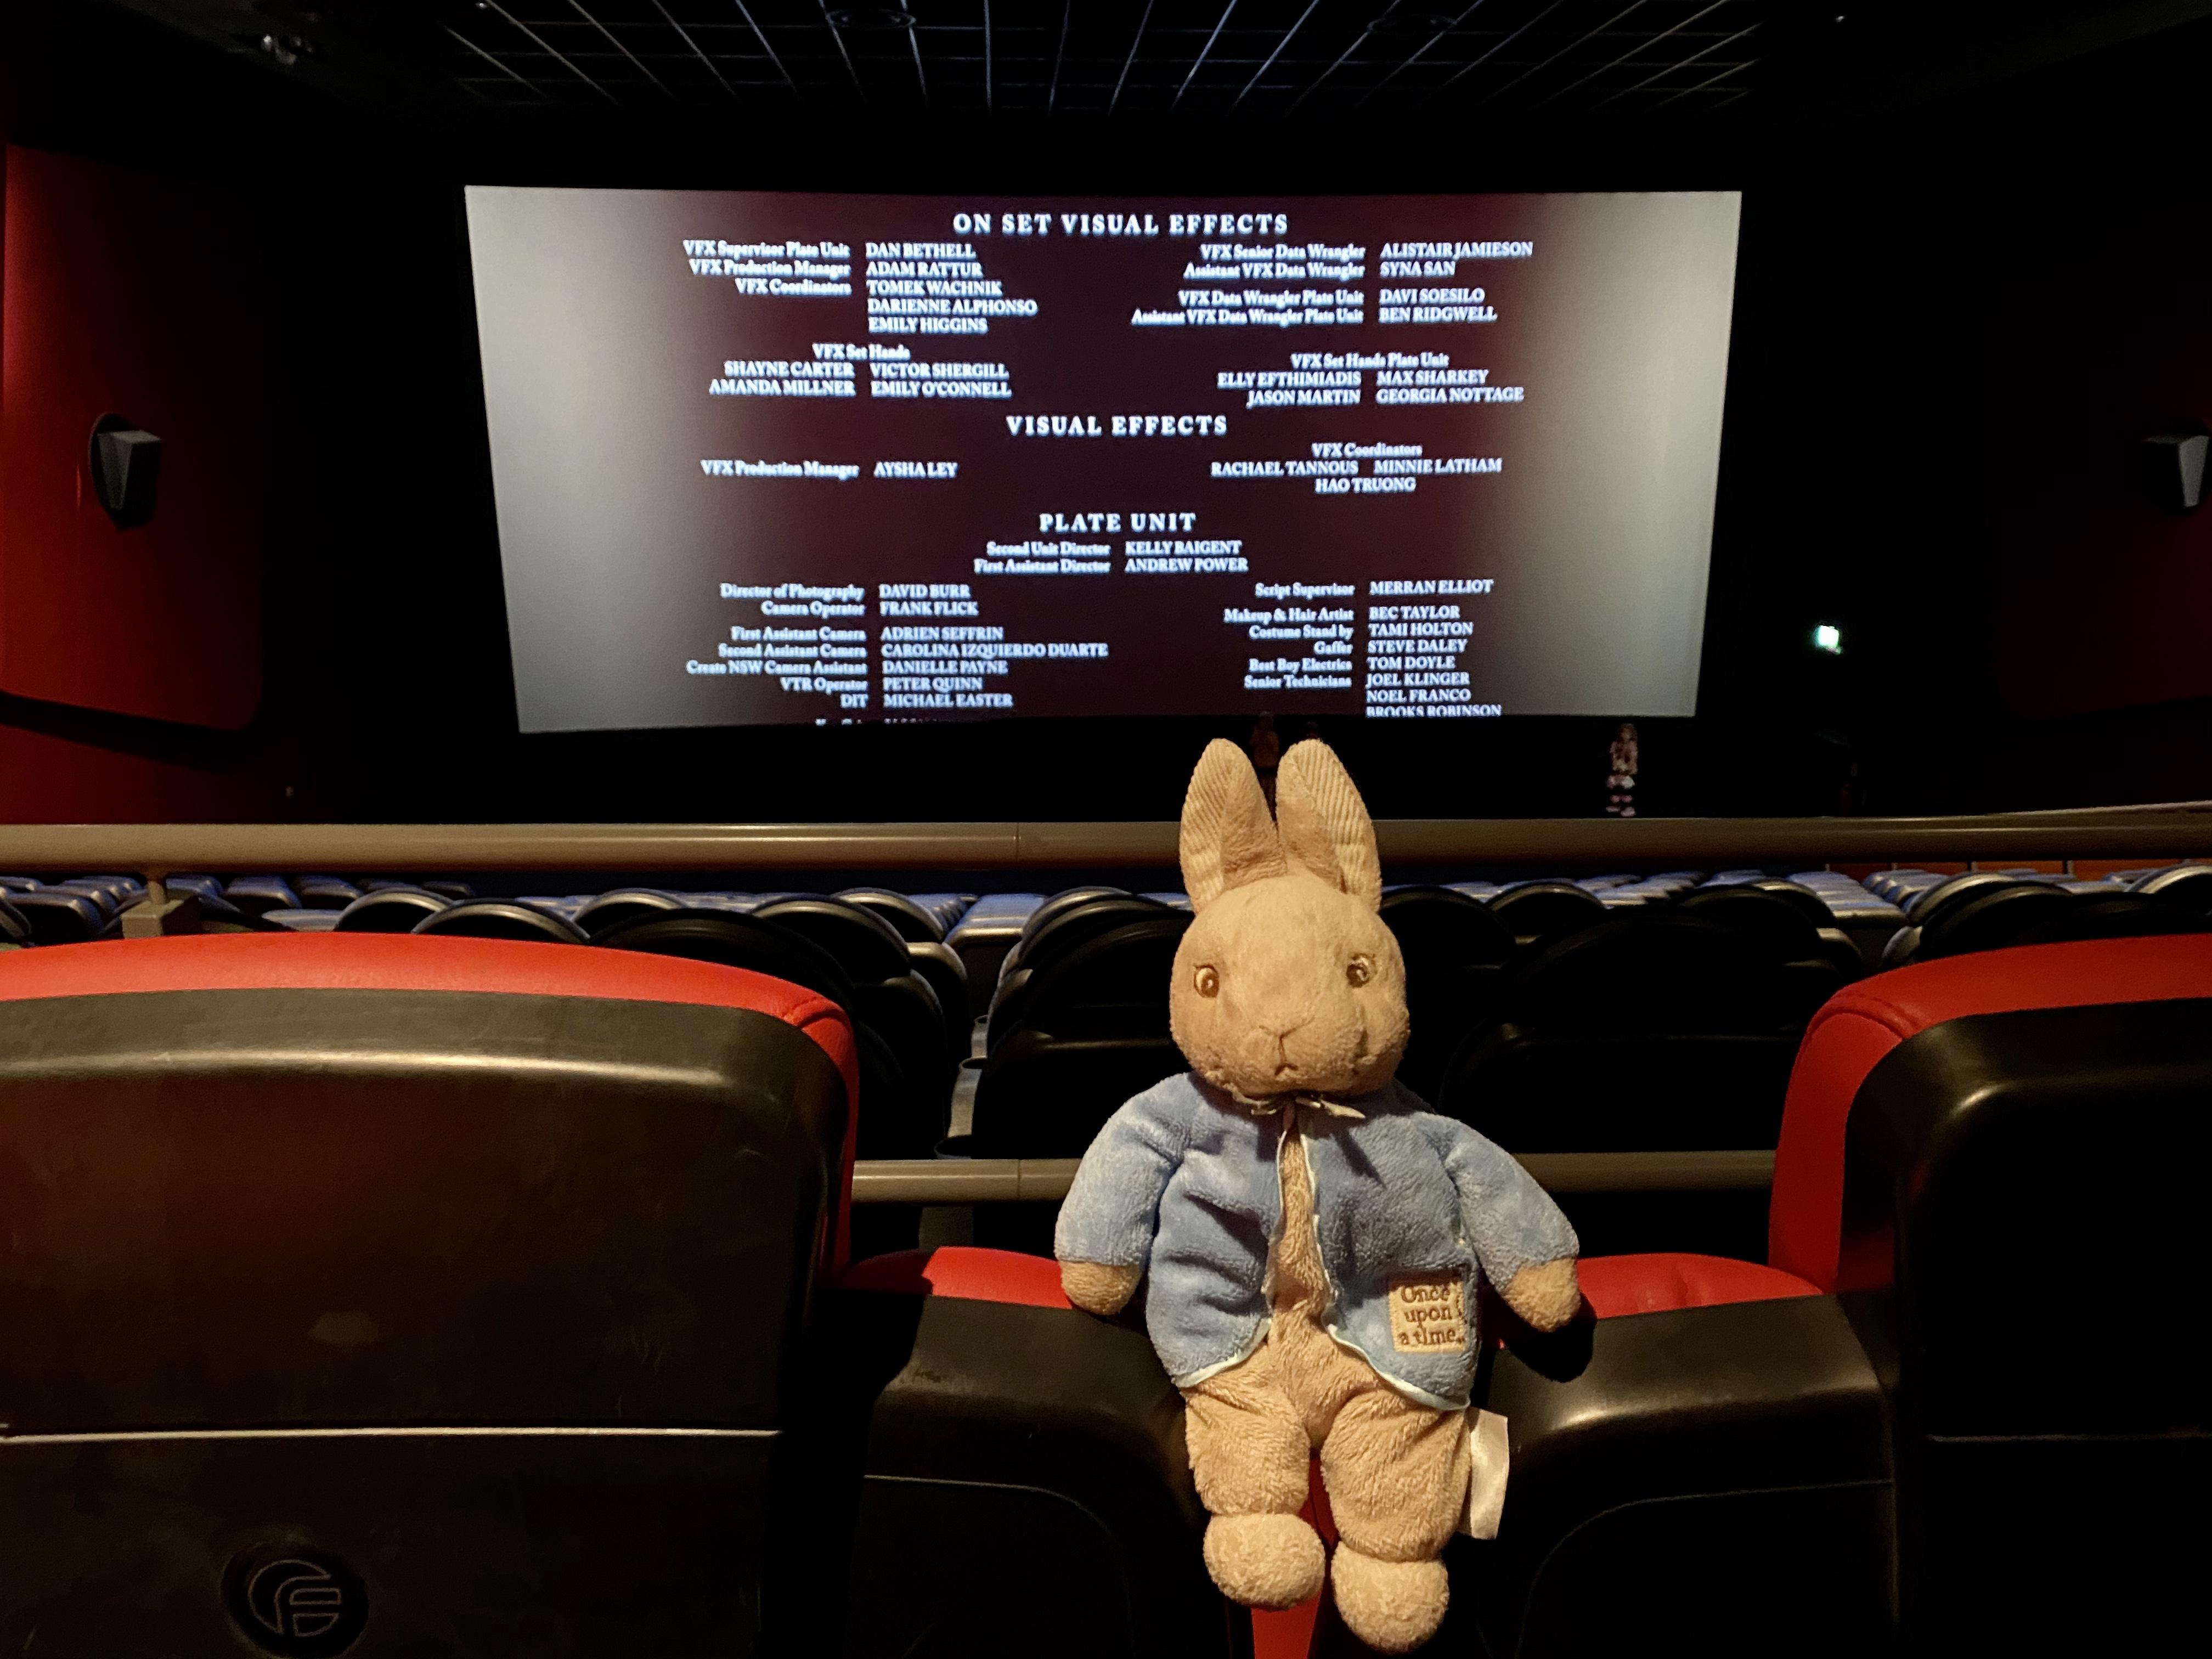 Peter Rabbit 2 Odeon Cardiff